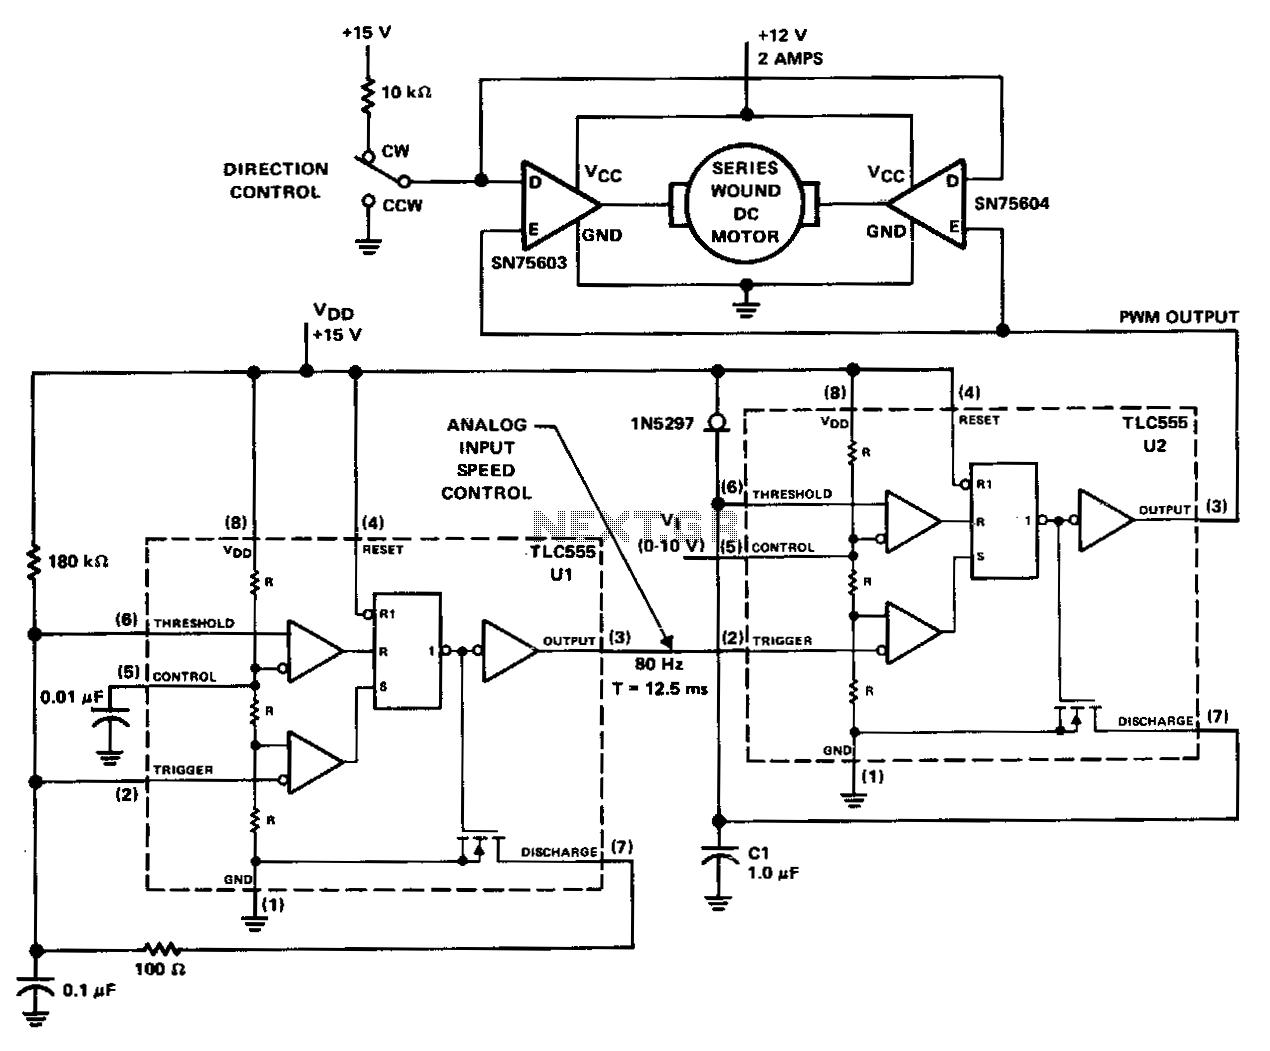 Pwm-motor-controller - schematic